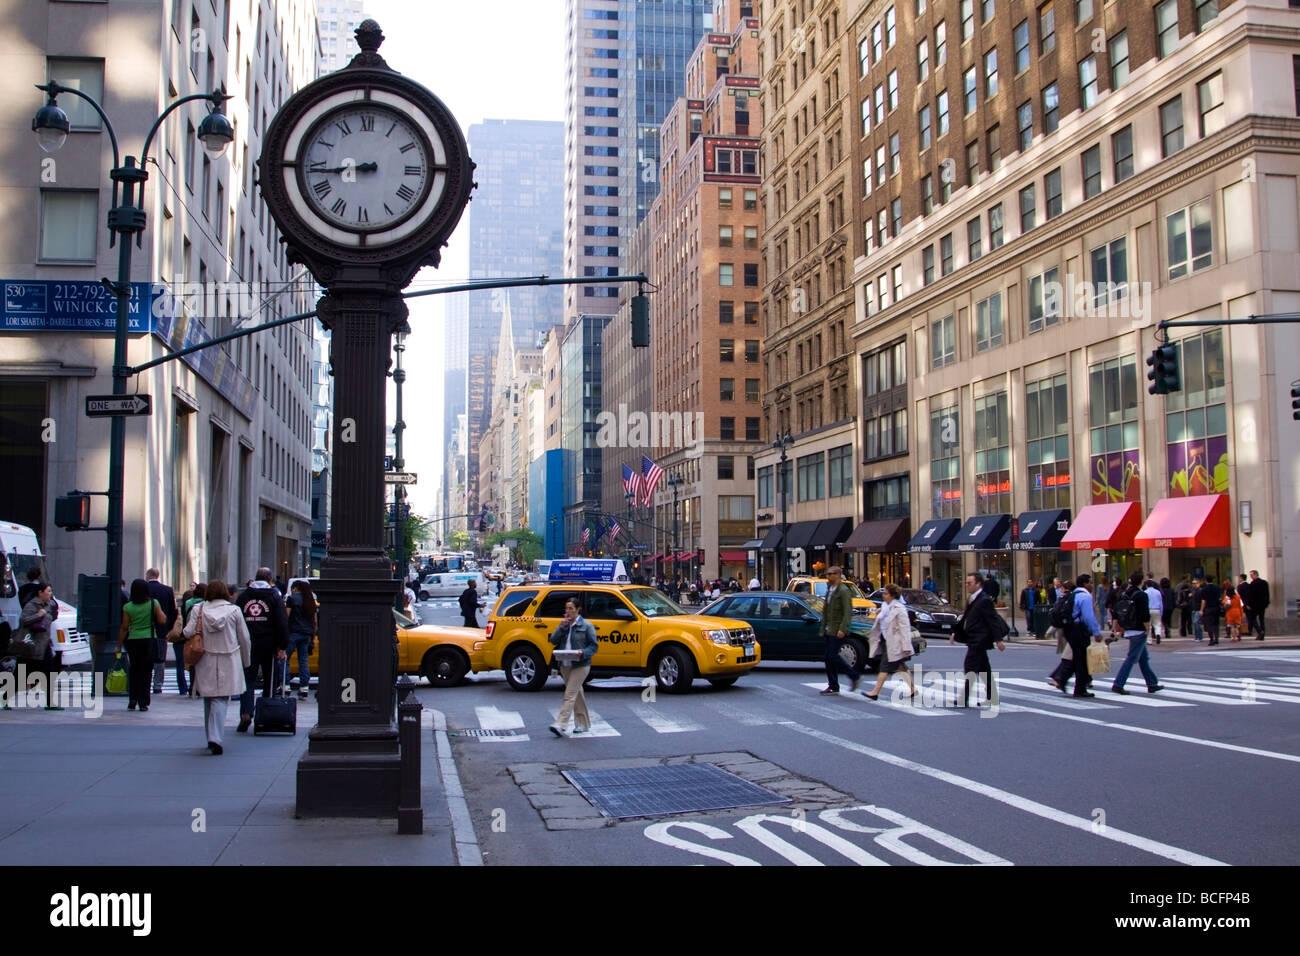 5th Avenue New York Stock Photos & 5th Avenue New York